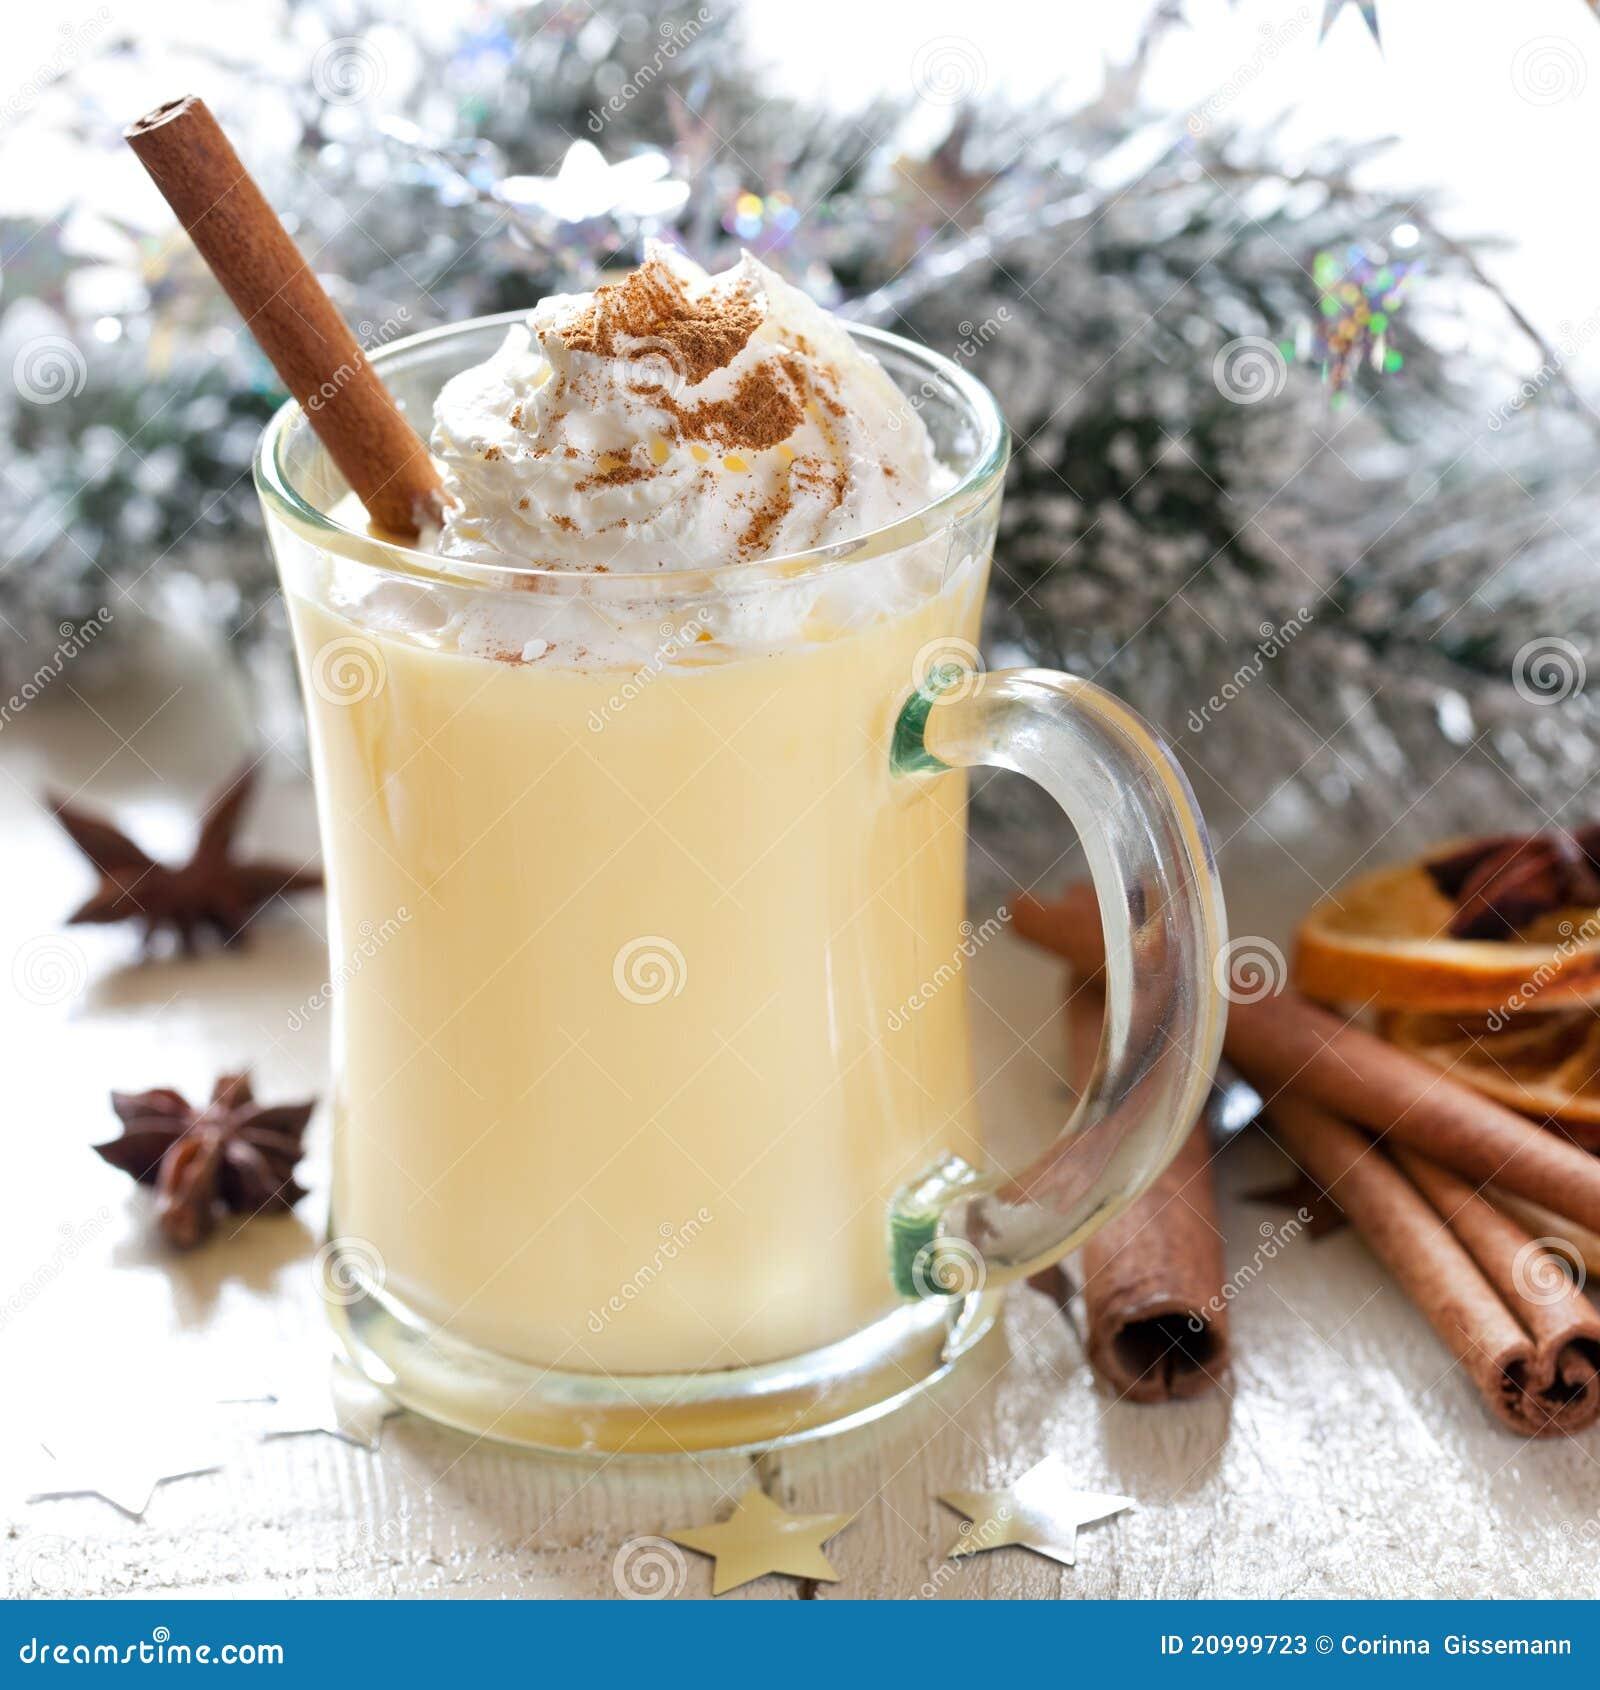 Fresh Eggnog Stock Image. Image Of Alcohol, Drink, Winter